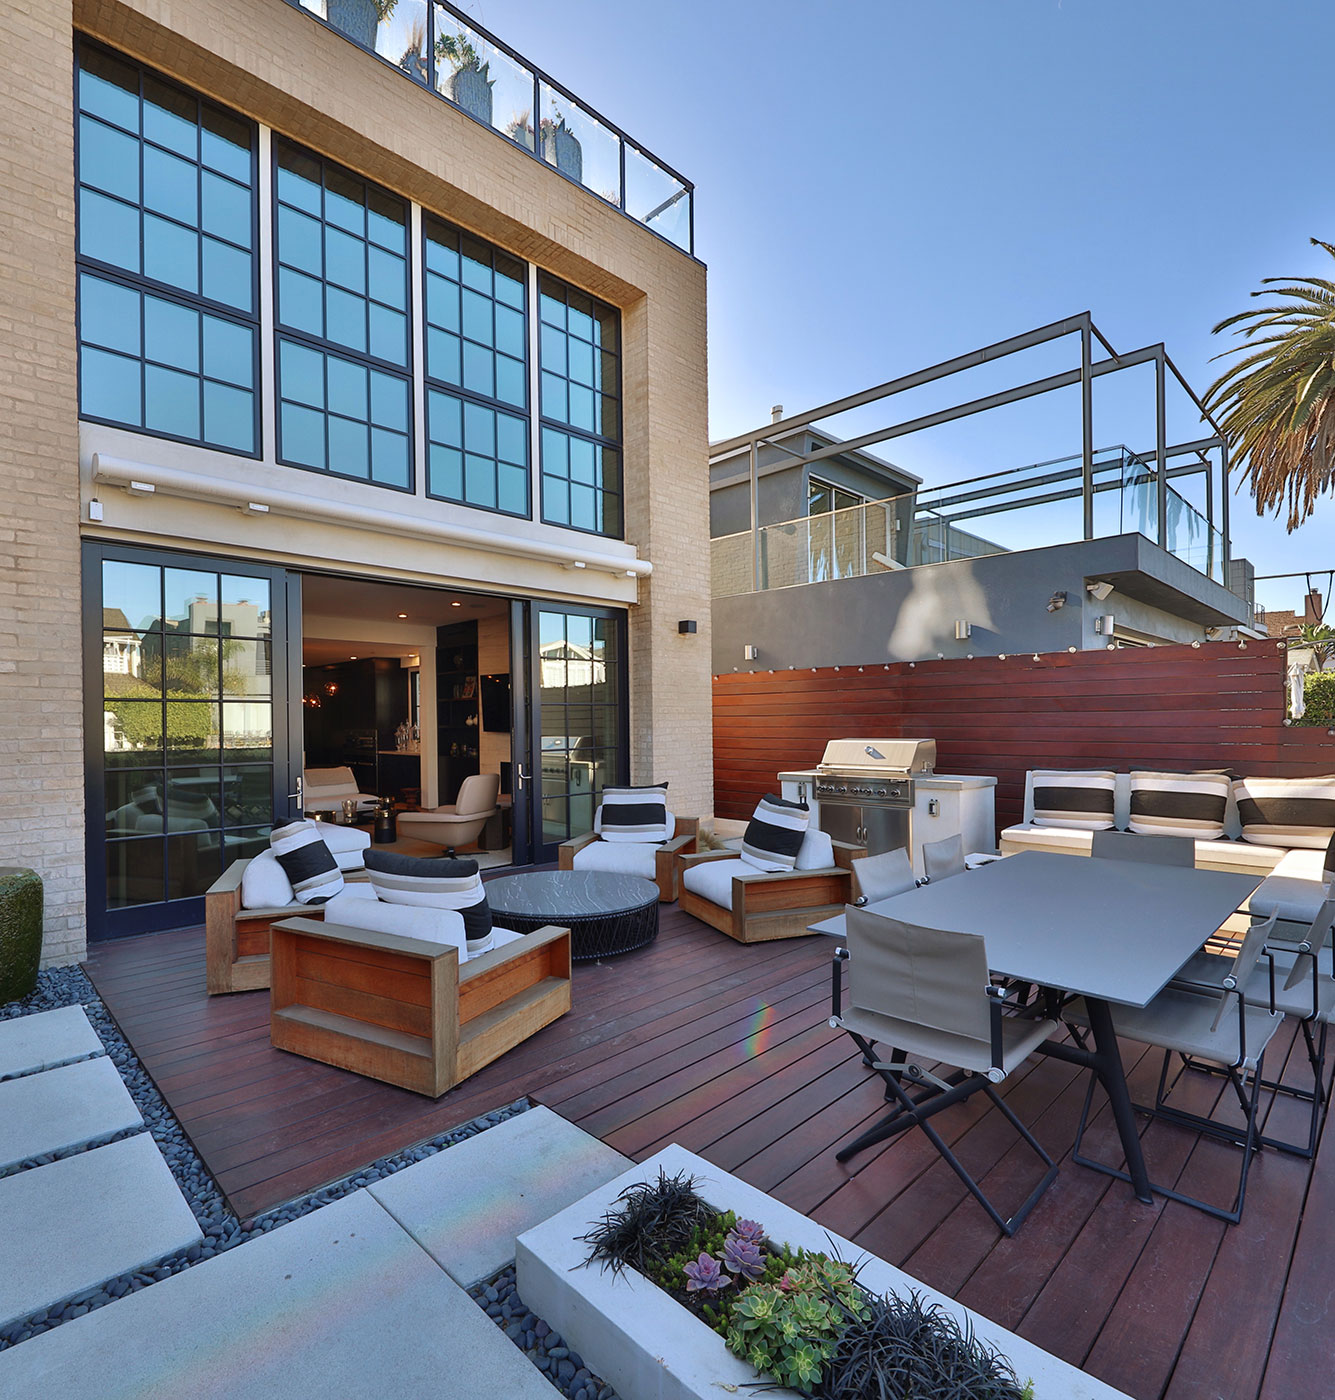 Outdoor-living-modern-architechture-SiliconBay-LosAngeles.JPG